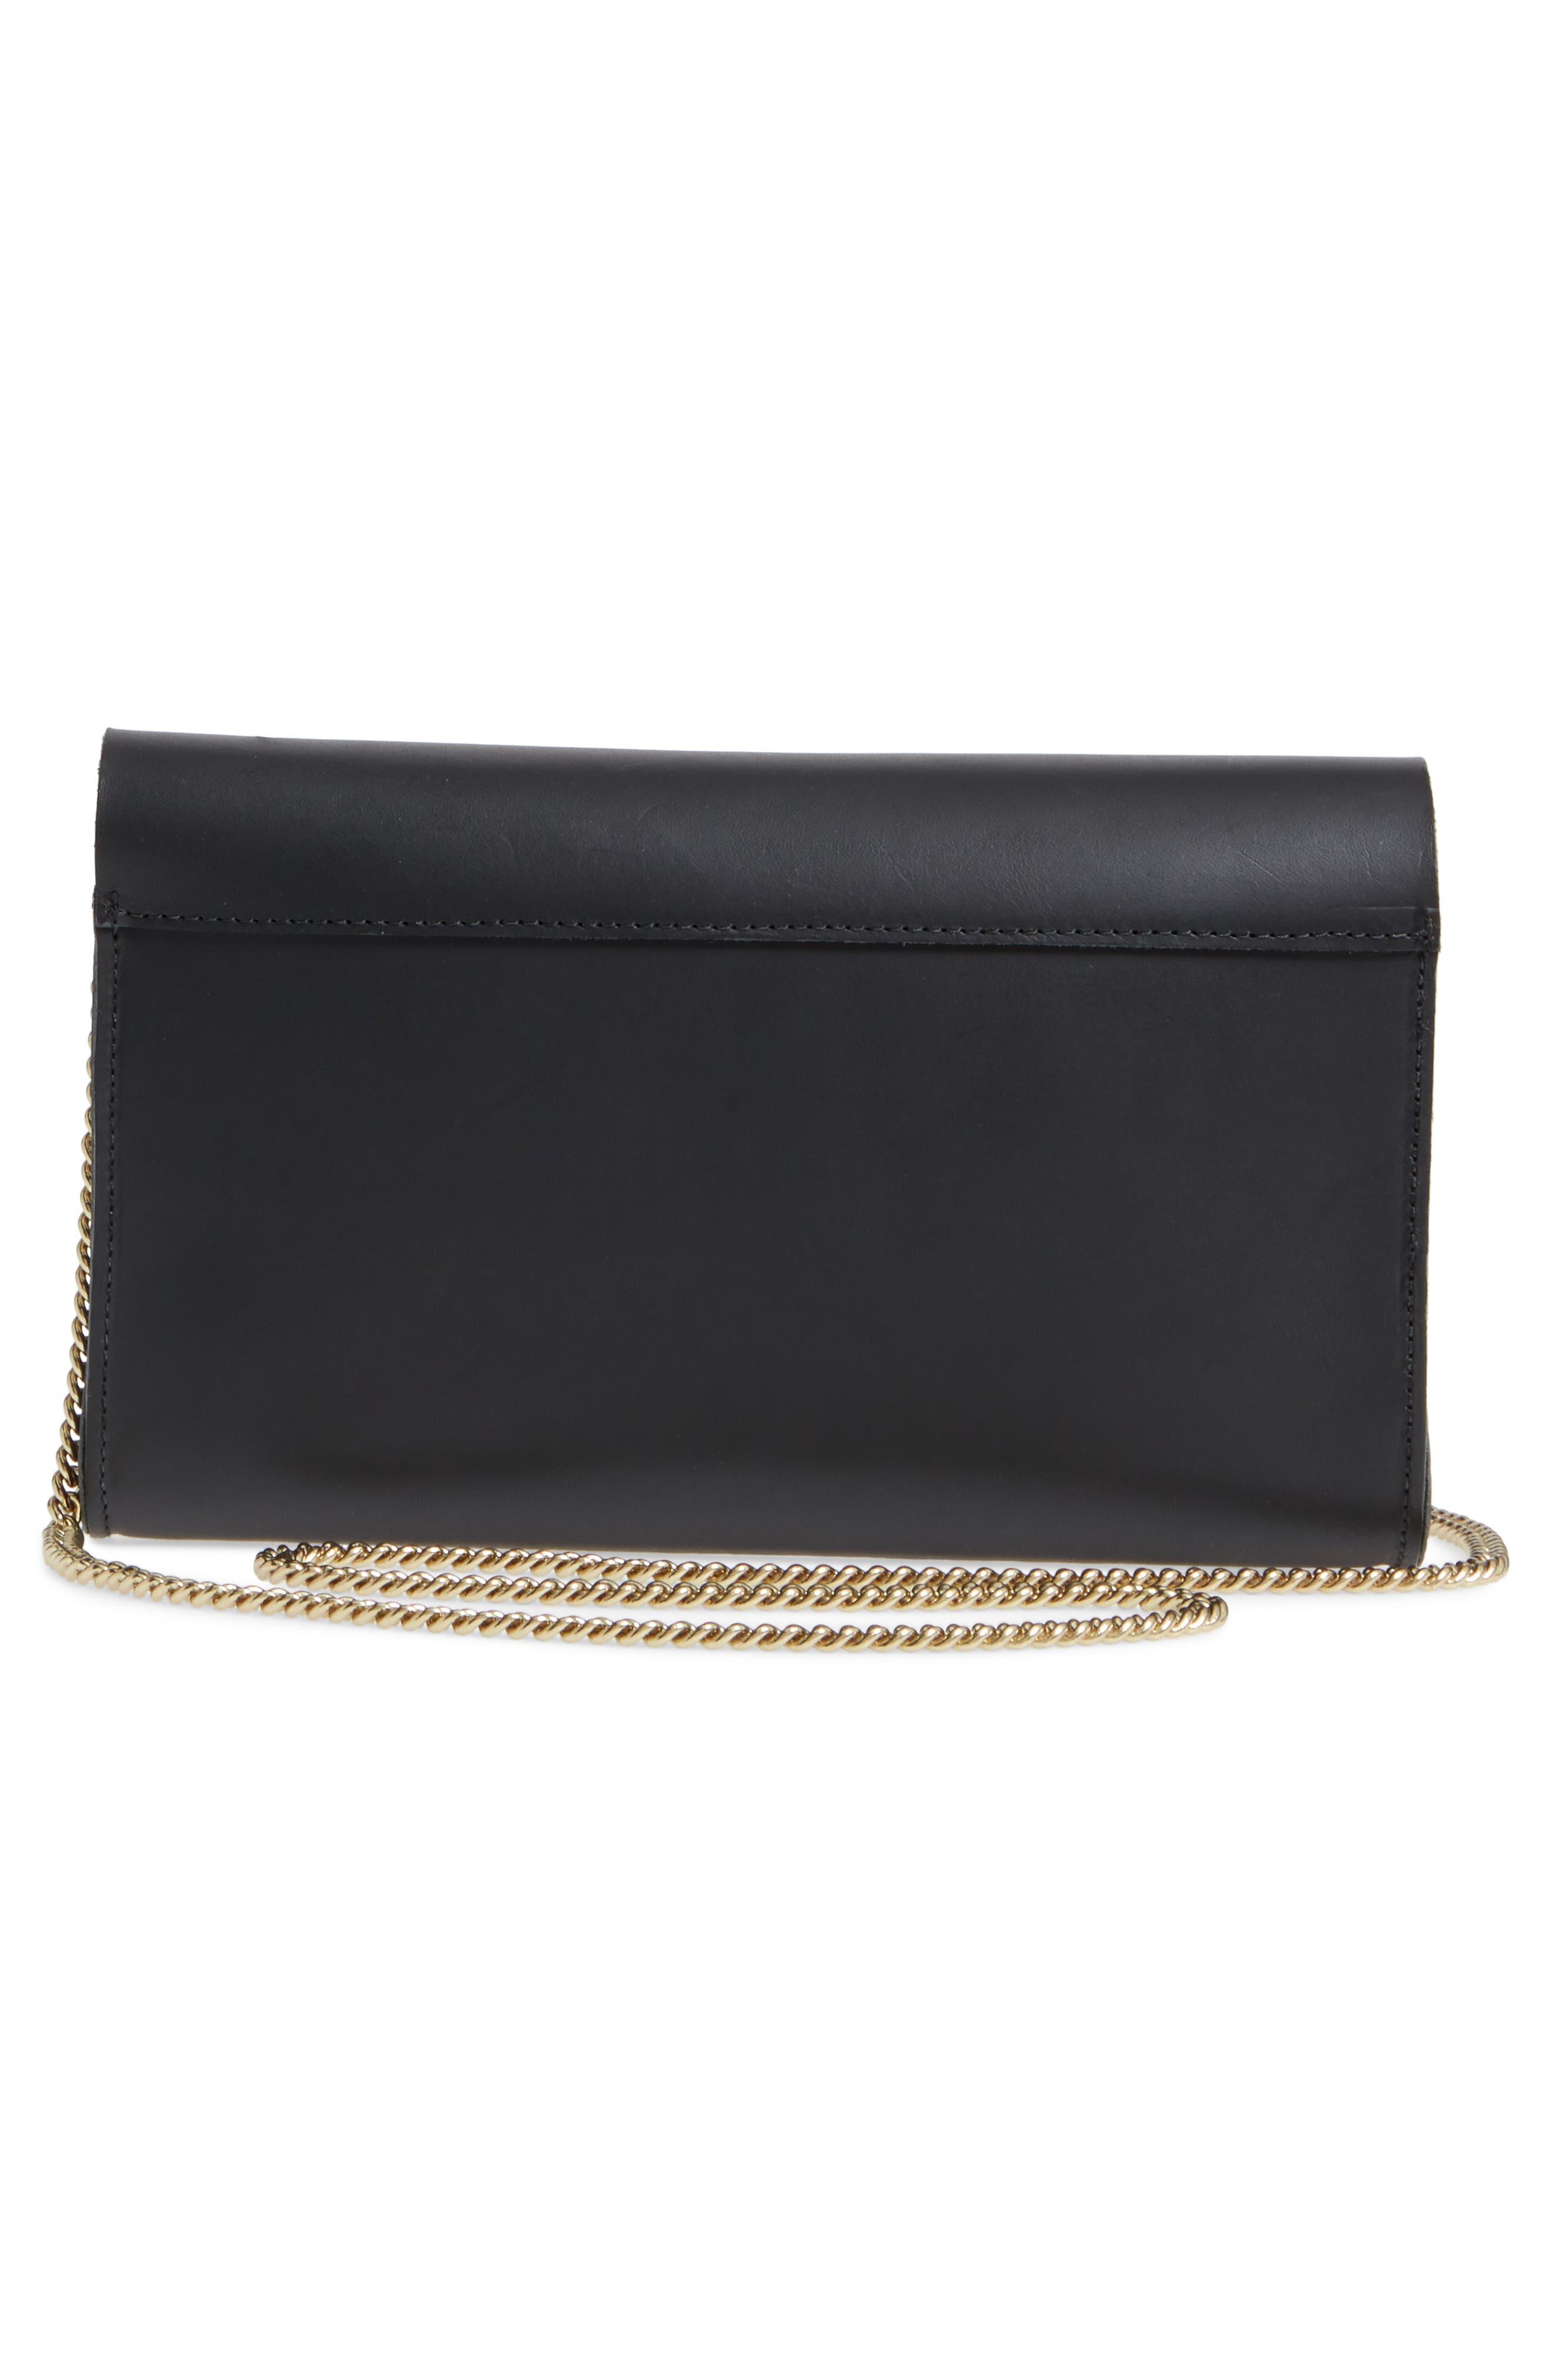 Colette Maison Leather Shoulder Bag,                             Alternate thumbnail 3, color,                             Black Veg